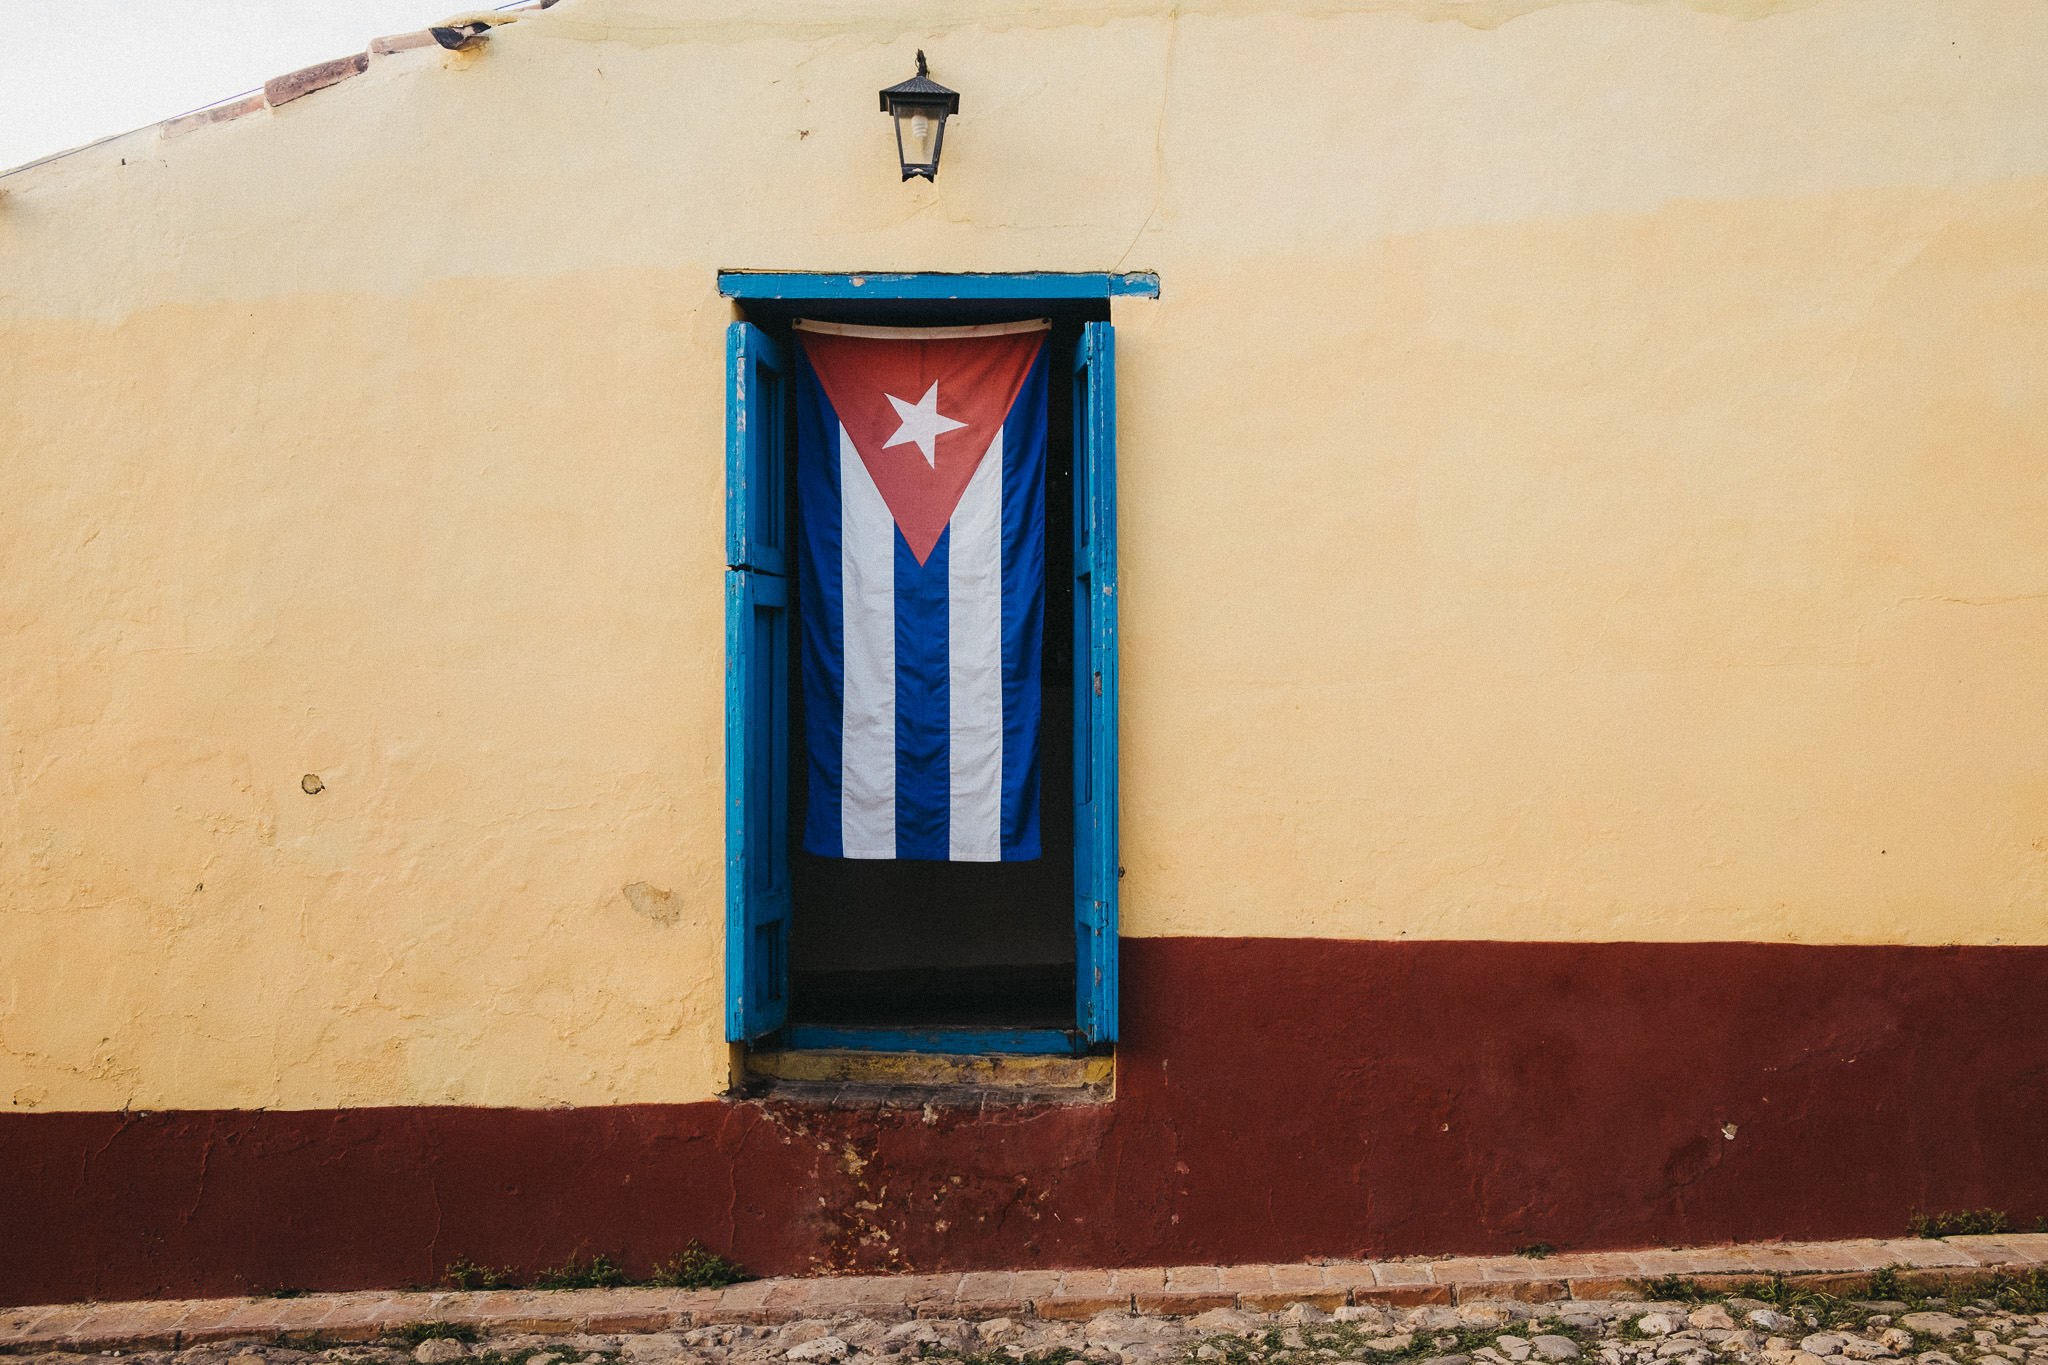 Cuba-2017-12-Trinidad-0280.jpg